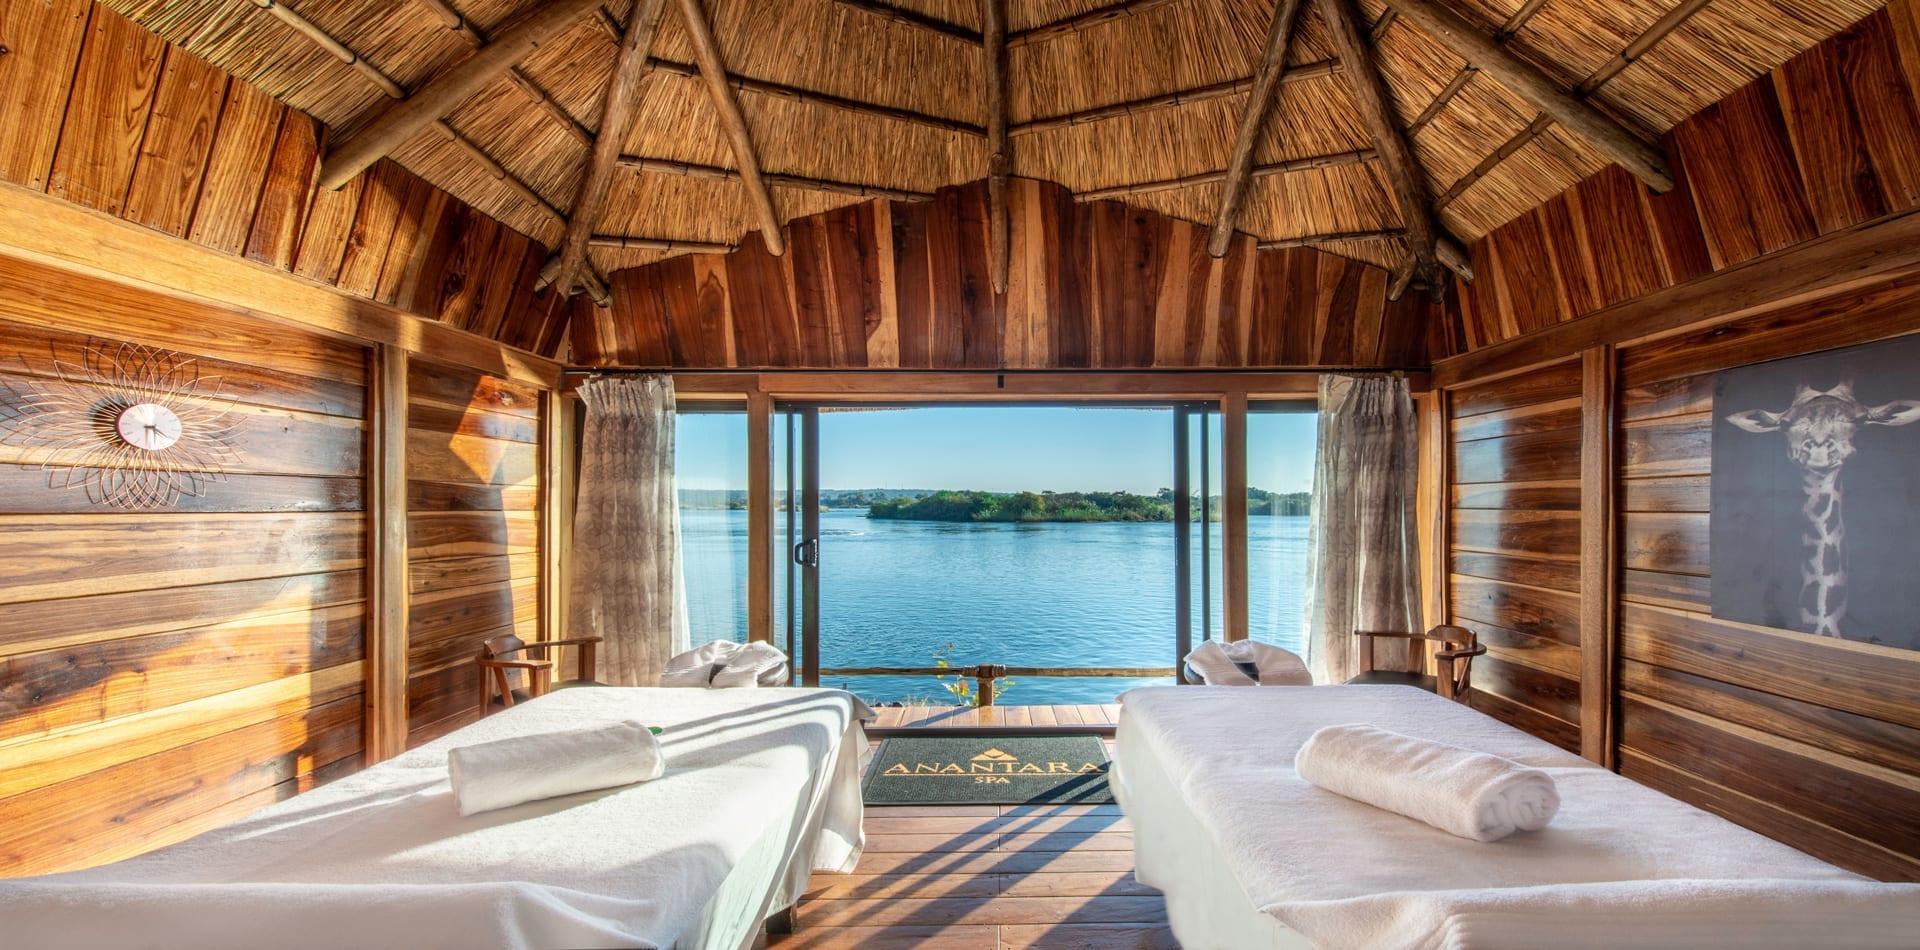 the royal livingstone river view zambia